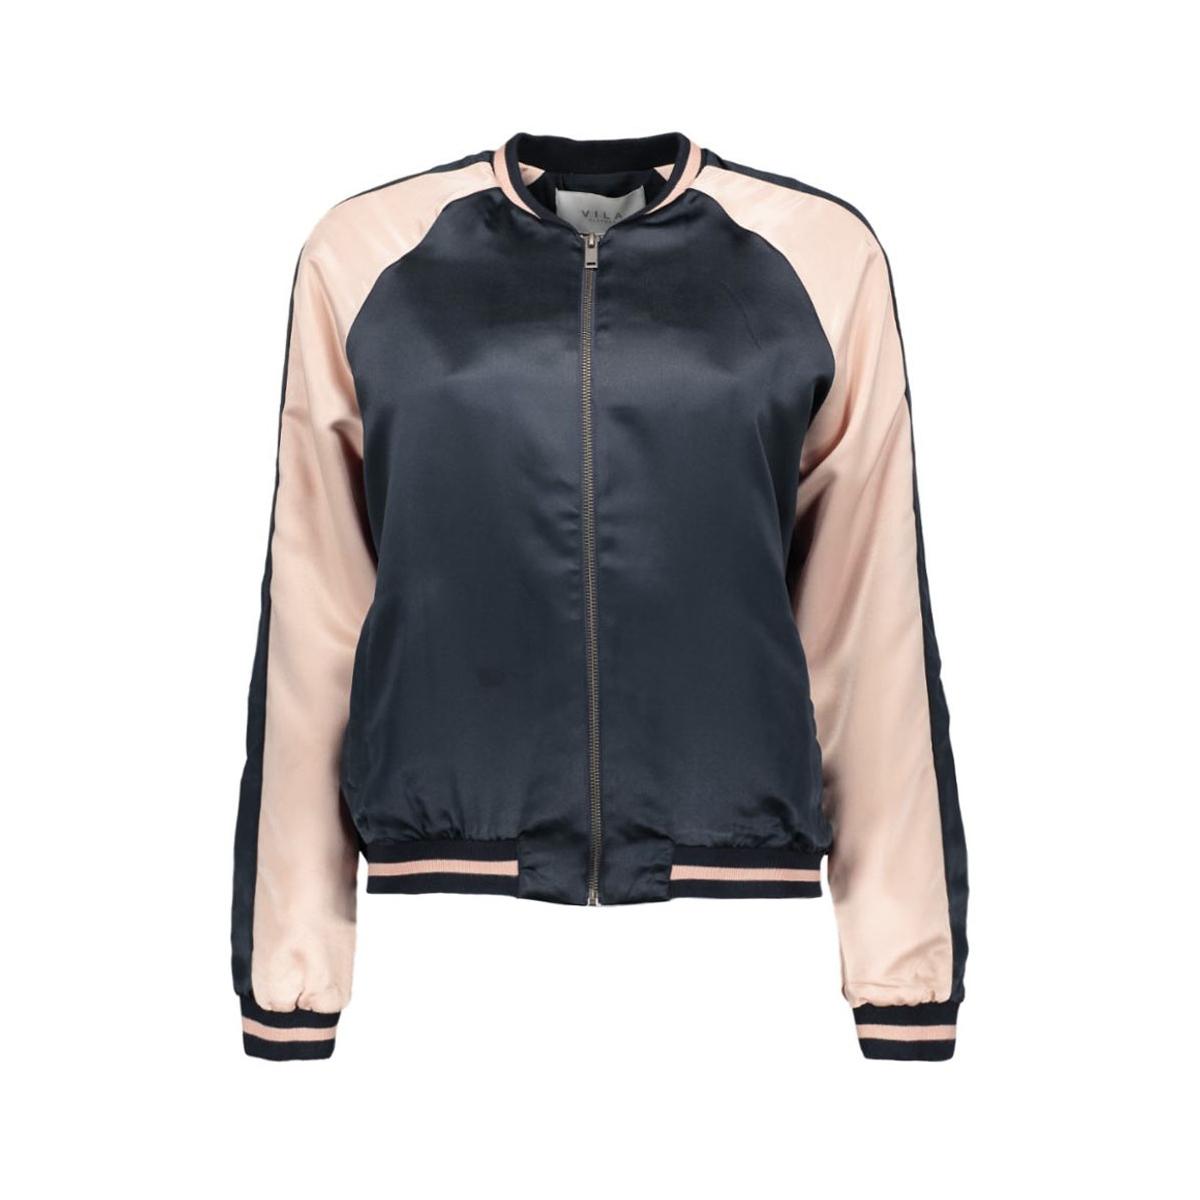 viadobe new bomber jacket 14040198 vila jas total eclipse/rose dust